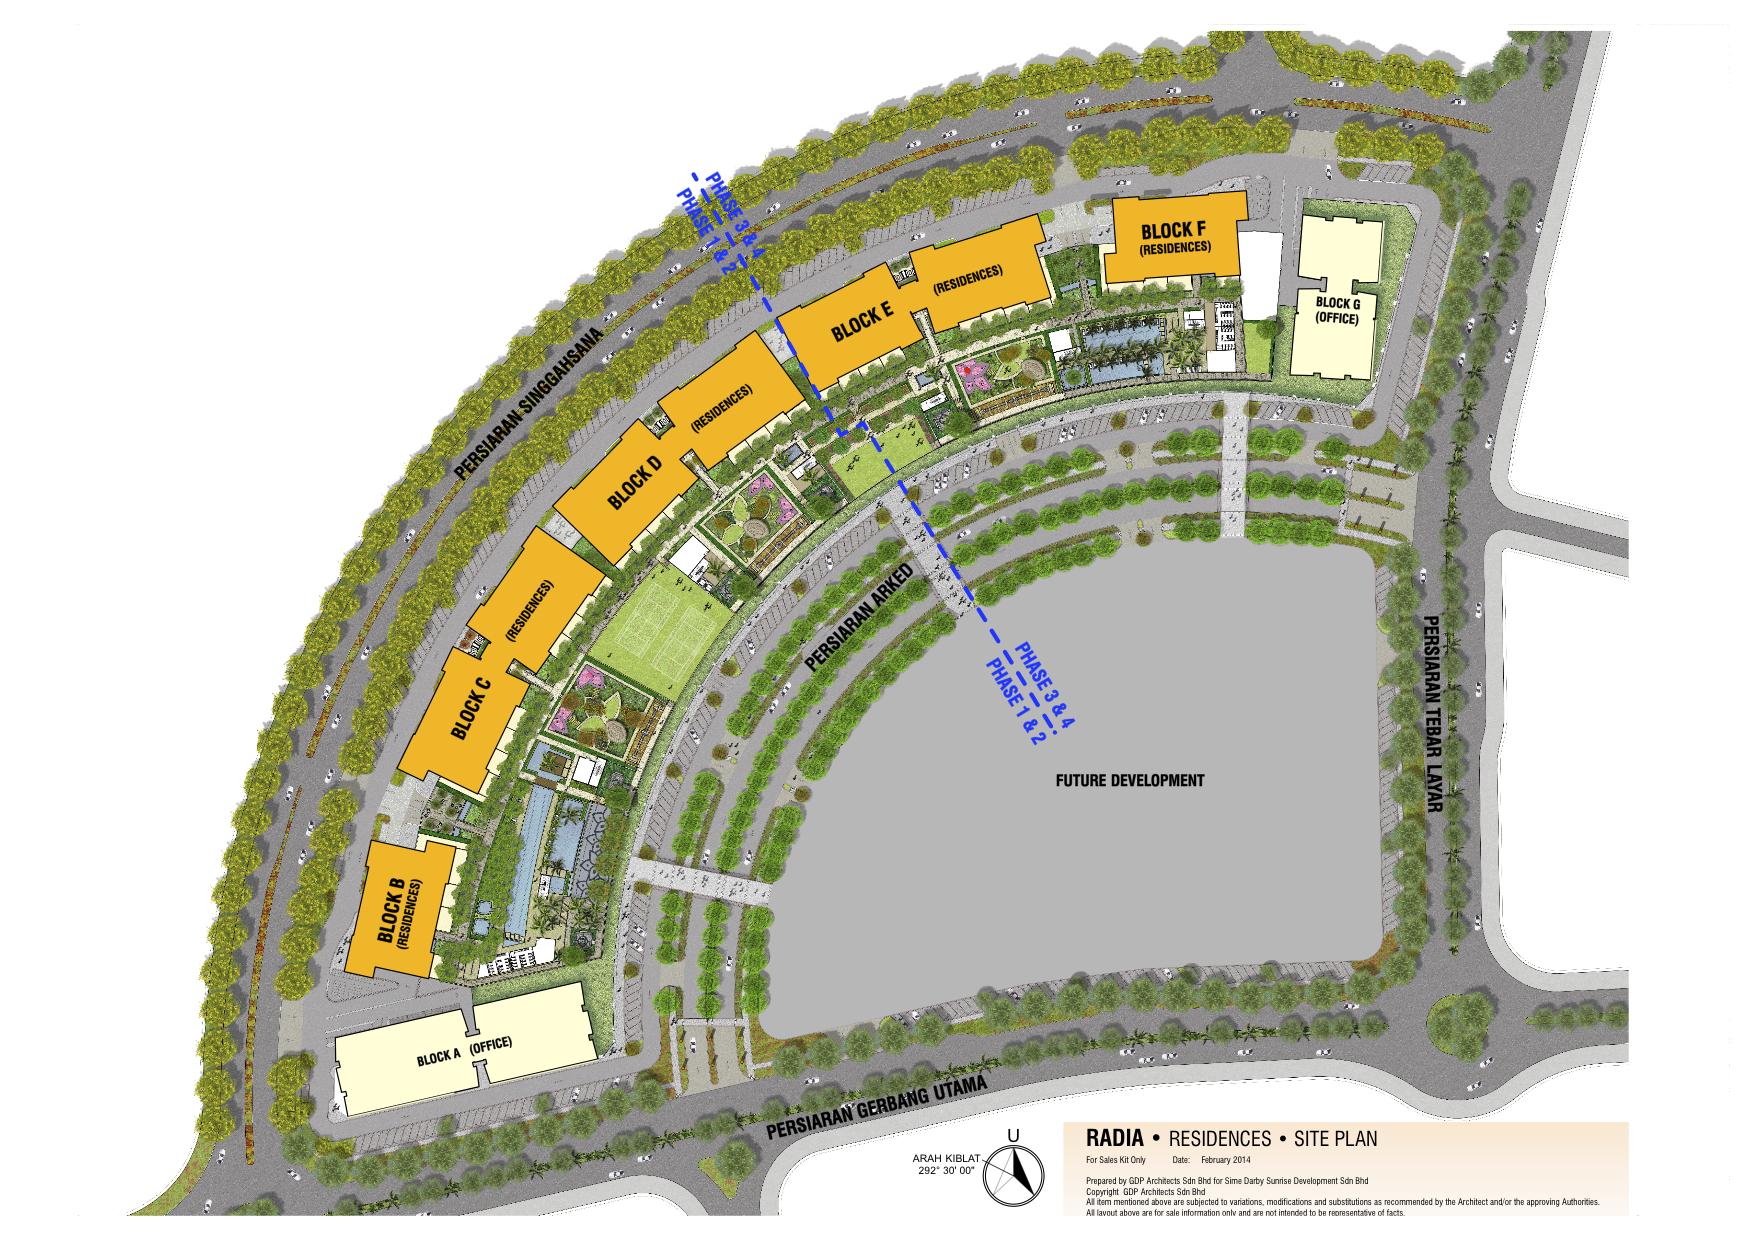 Site Plan of Radia Residences